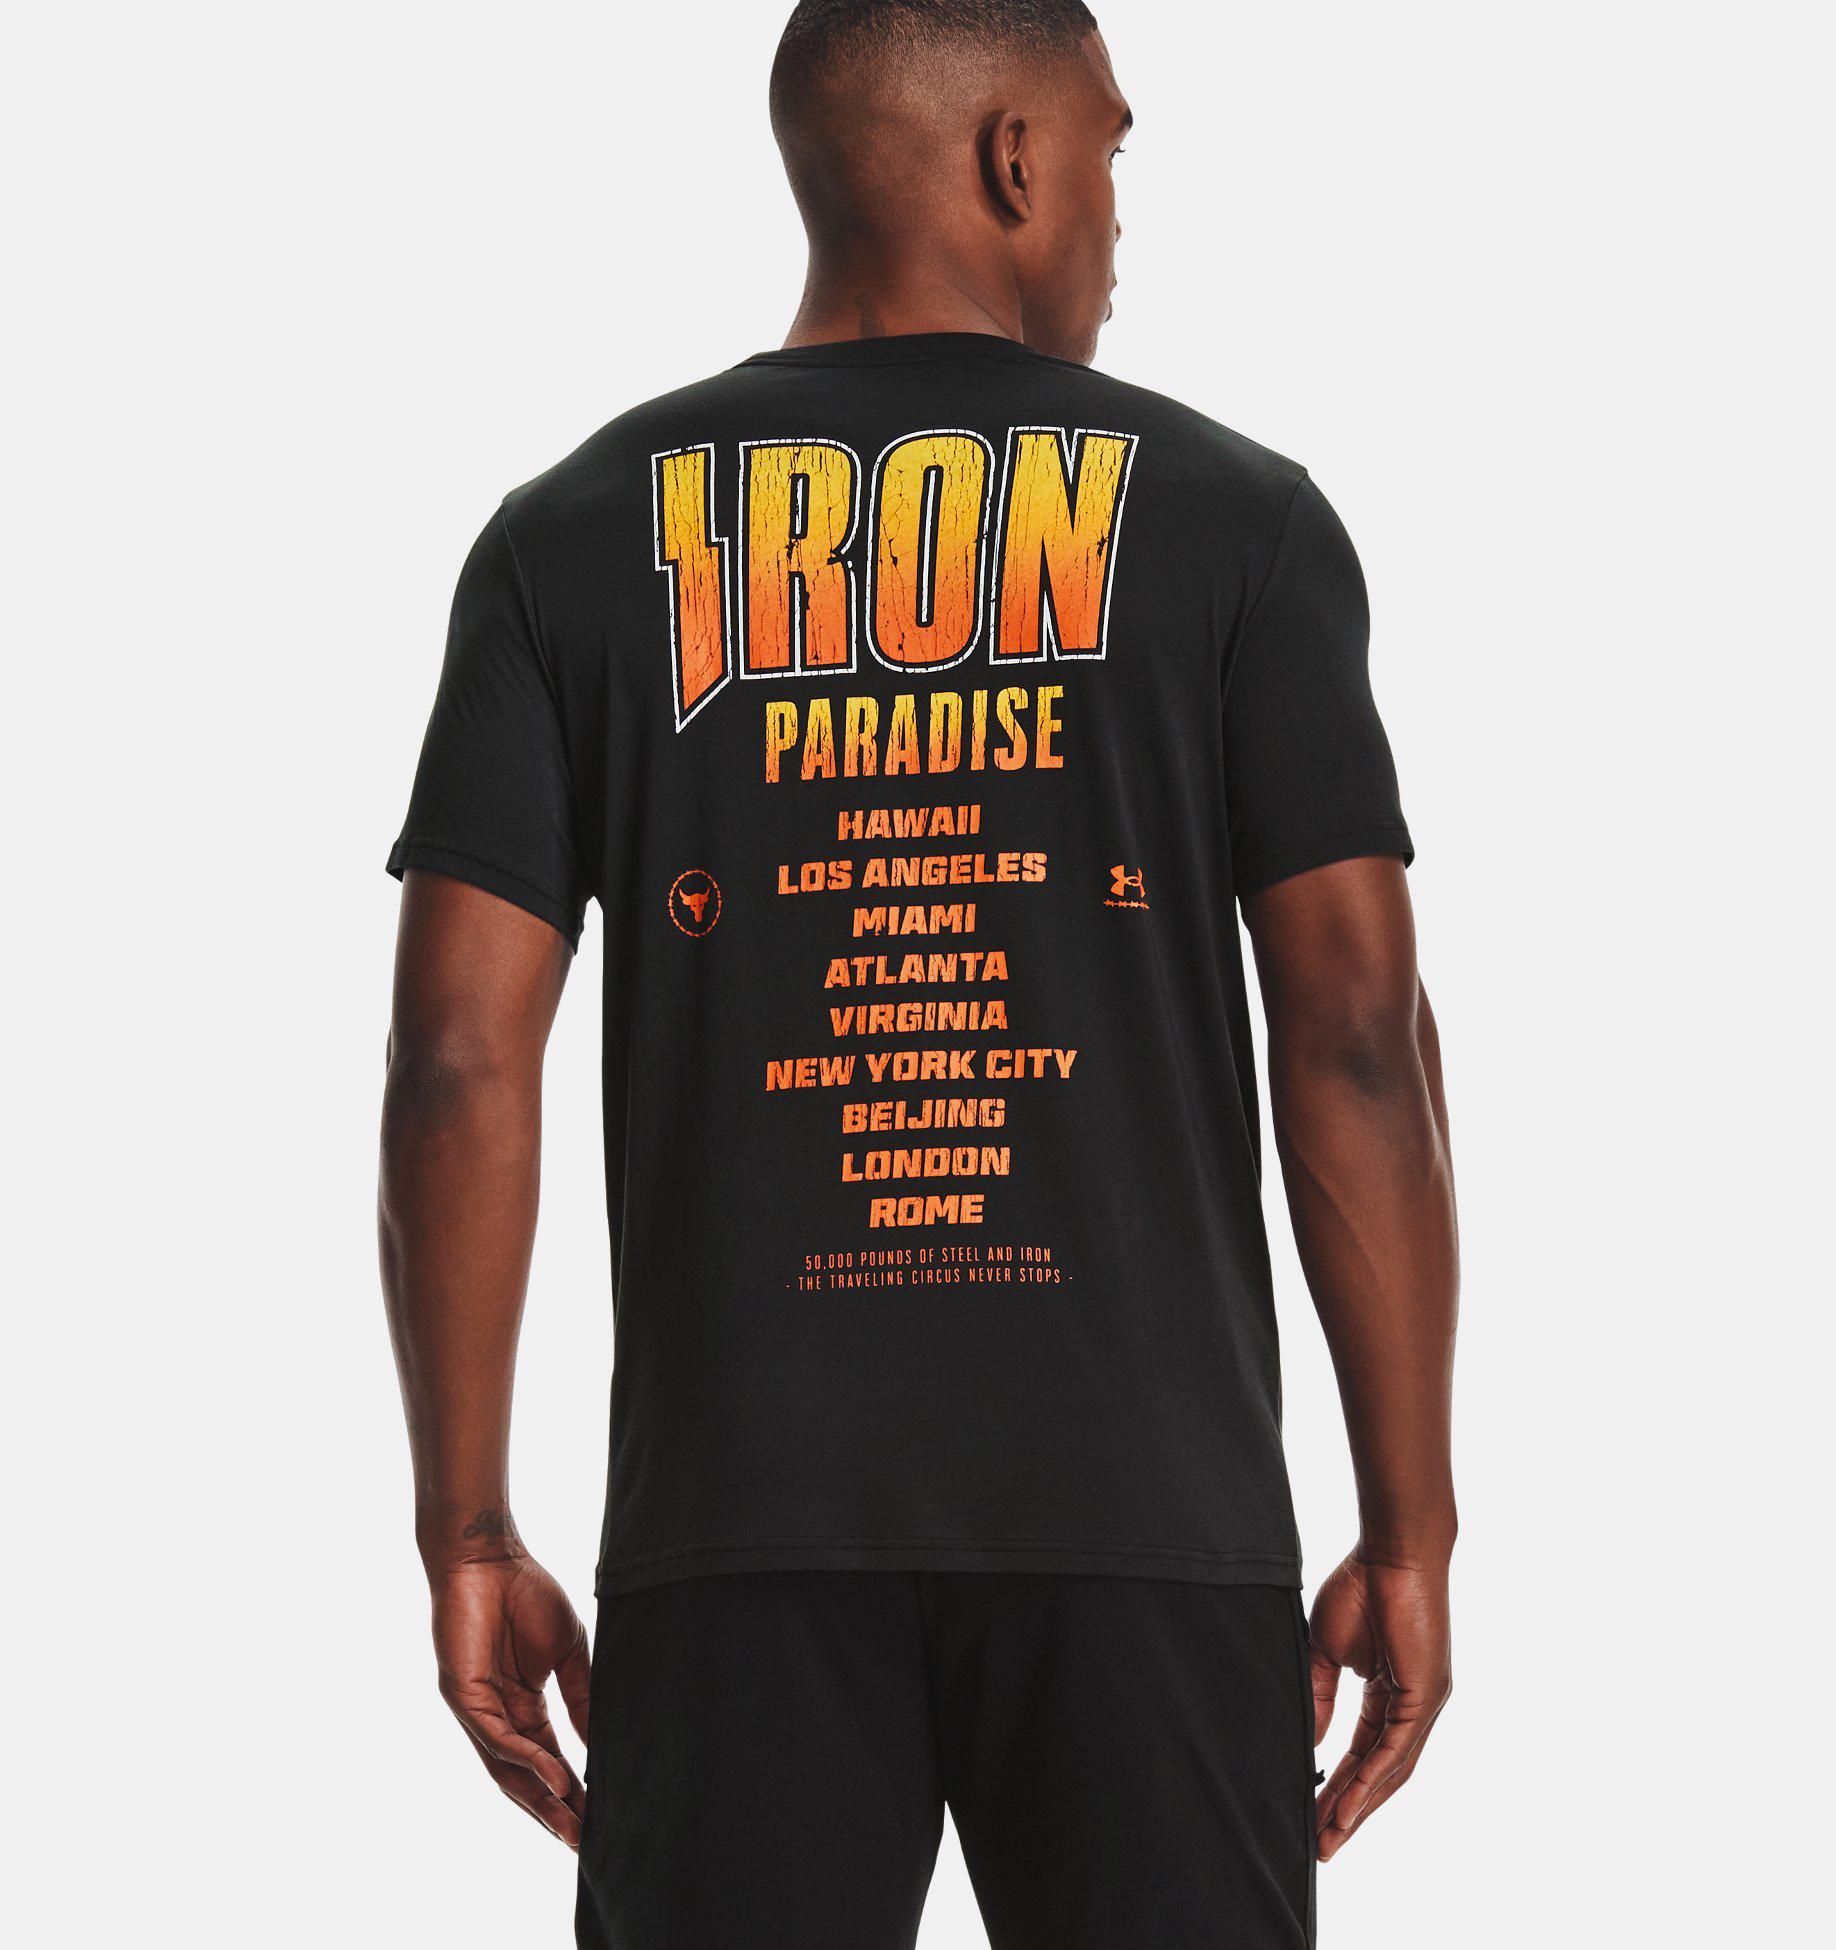 project-rock-iron-paradise-tour-t-shirt-2